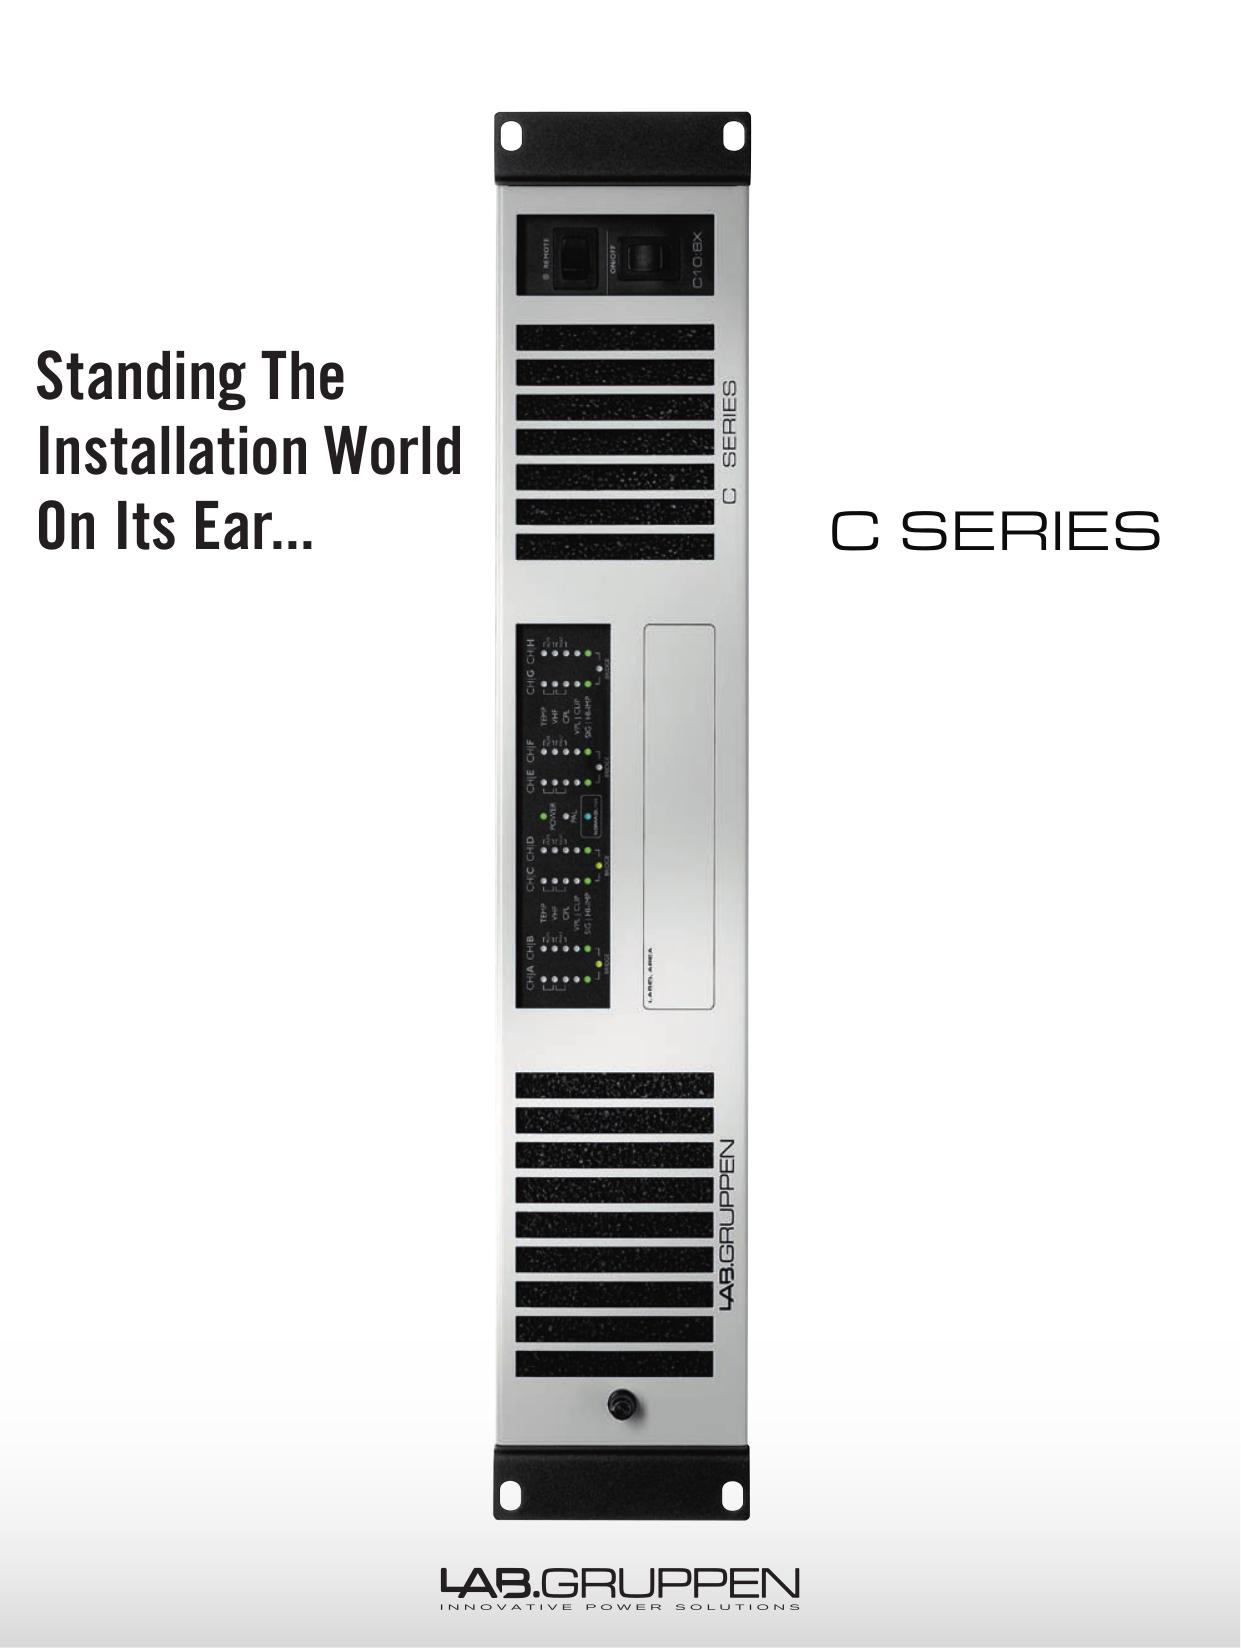 pdf for Lab.gruppen Amp C Series C 48 4 manual